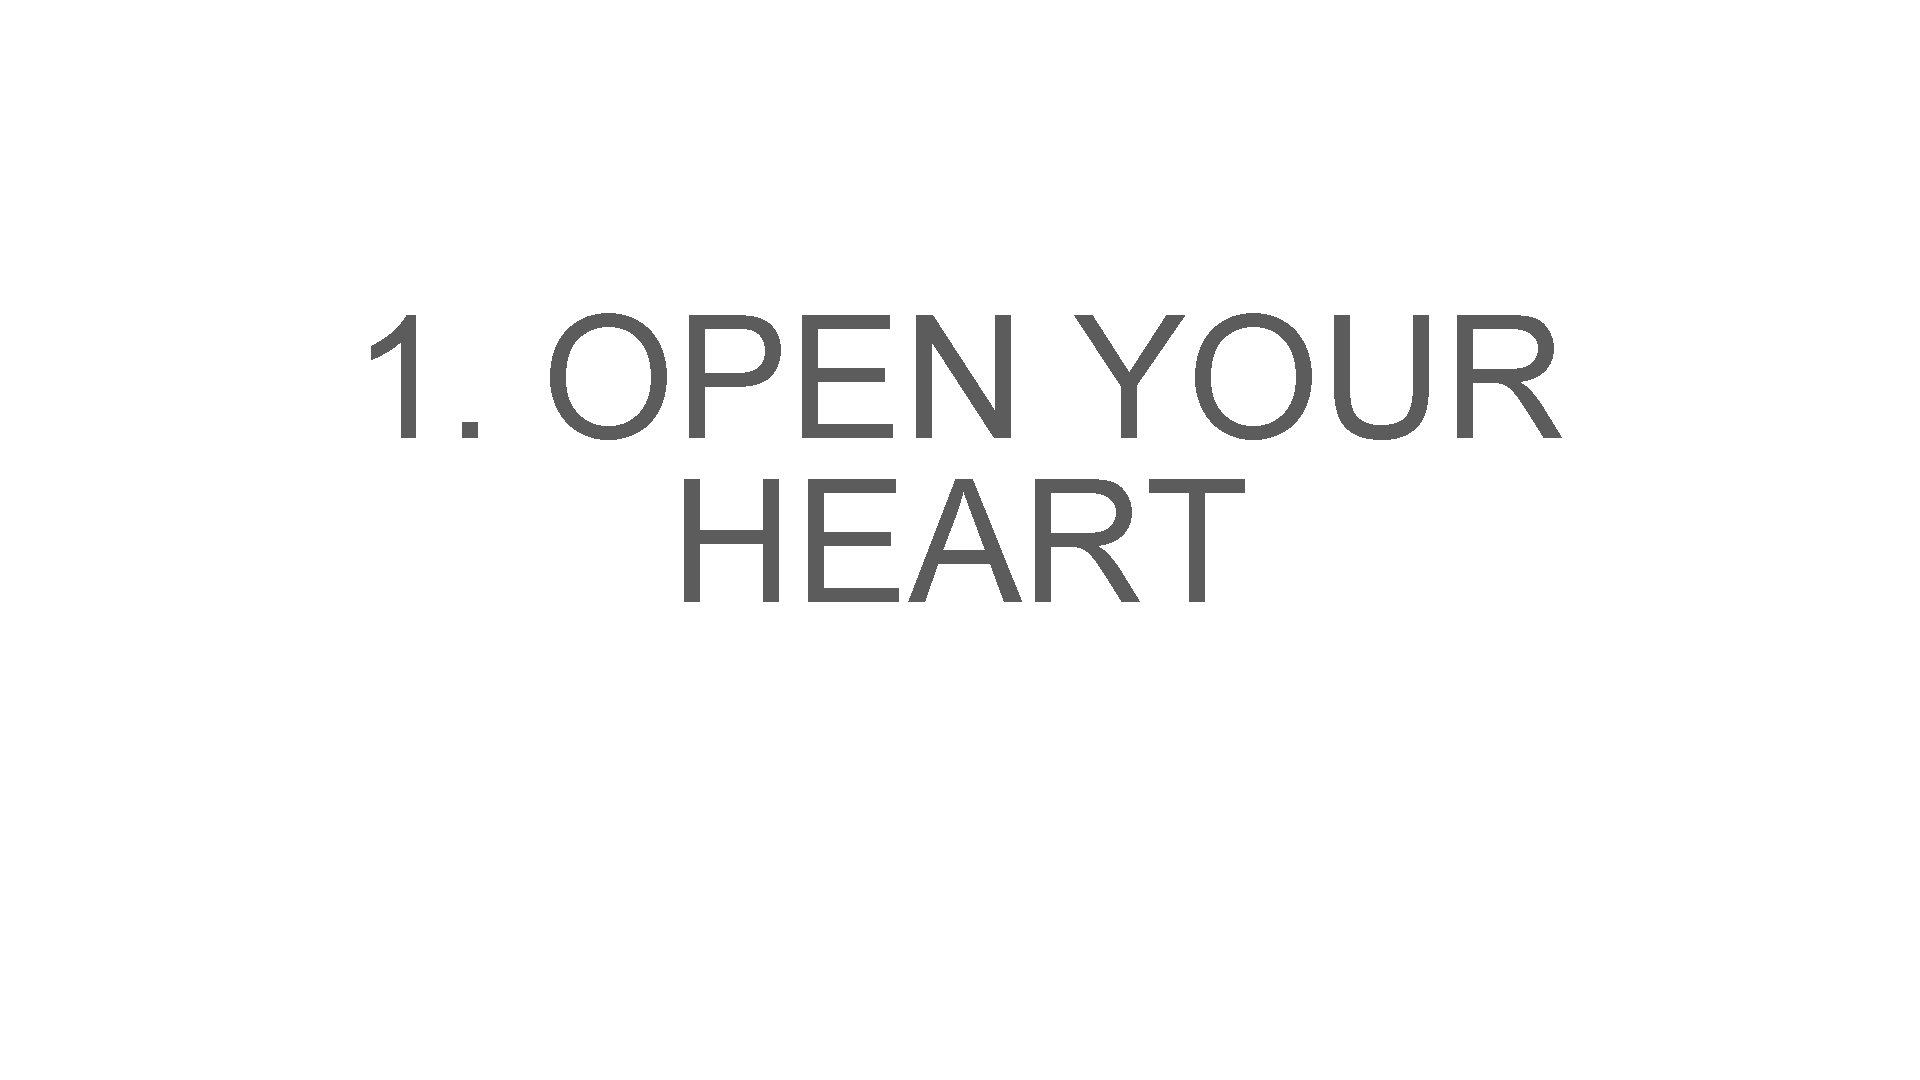 1. OPEN YOUR HEART